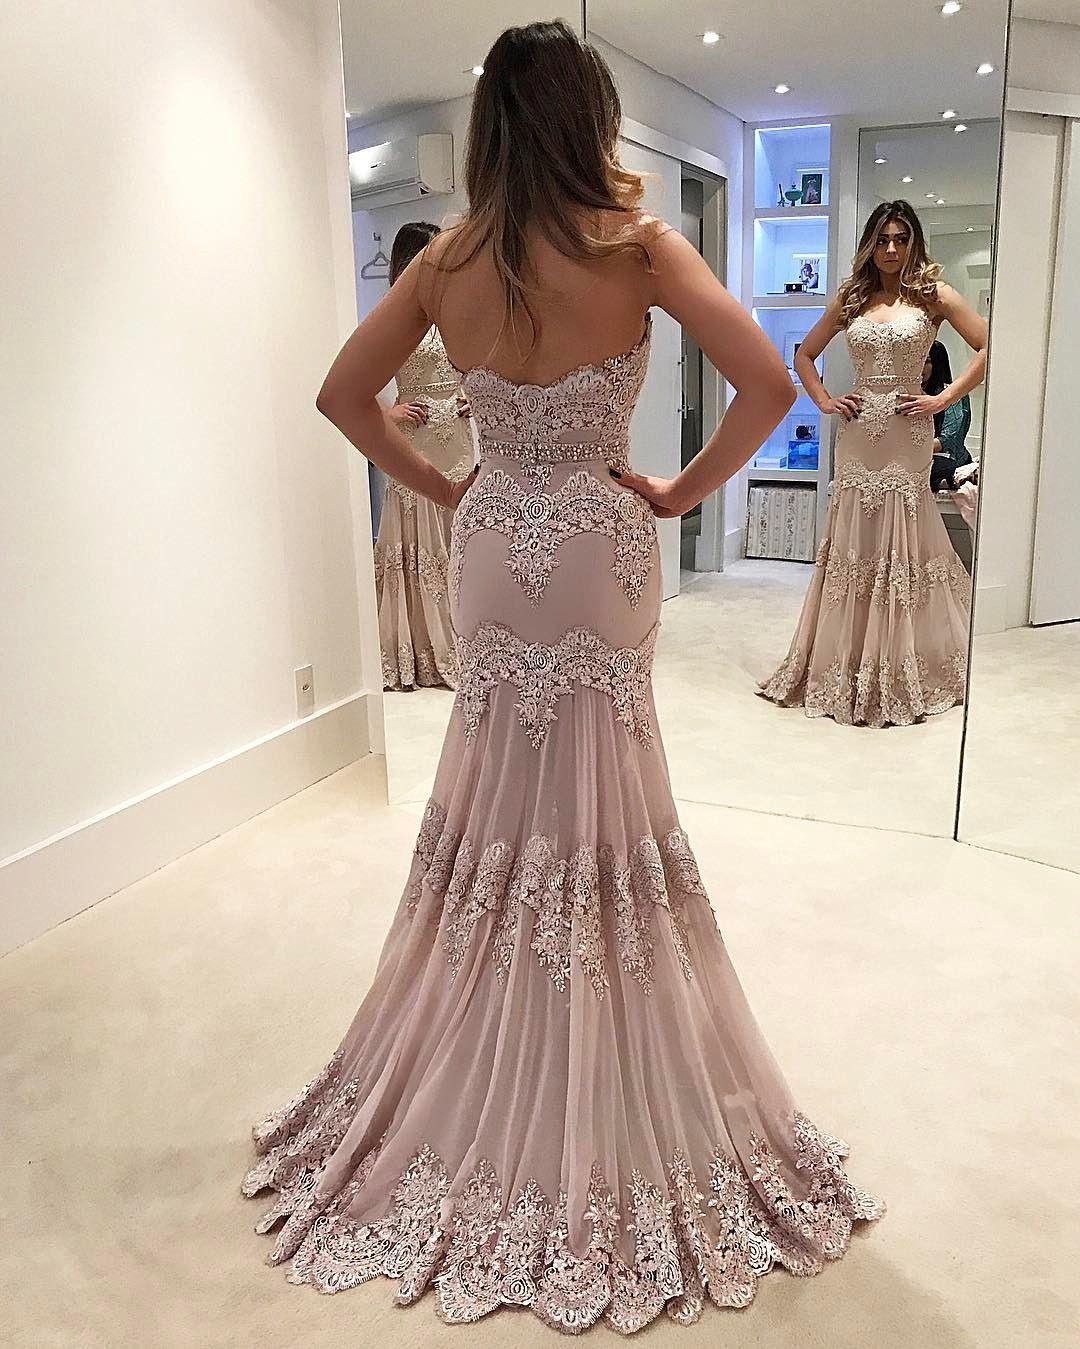 Abend Großartig Abendkleid Günstig Online Kaufen Stylish17 Schön Abendkleid Günstig Online Kaufen Ärmel